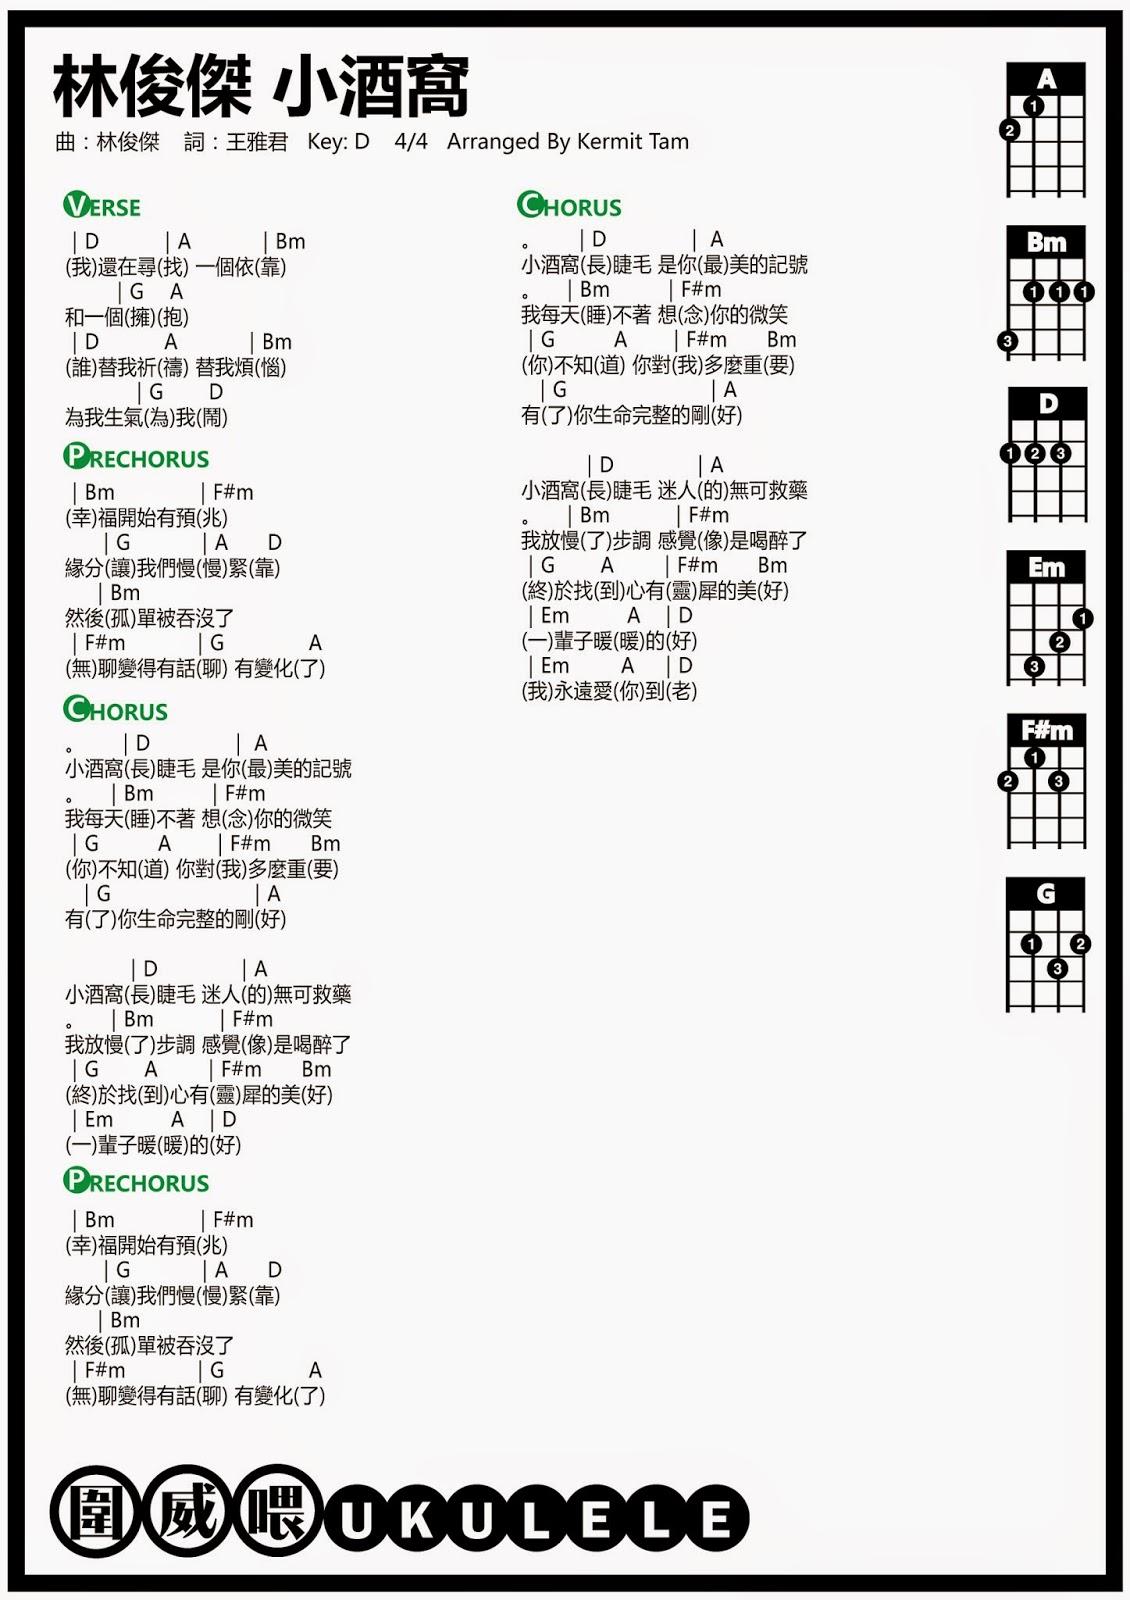 圍威喂 ukulele: 林俊傑 小酒窩 [ukulele譜]